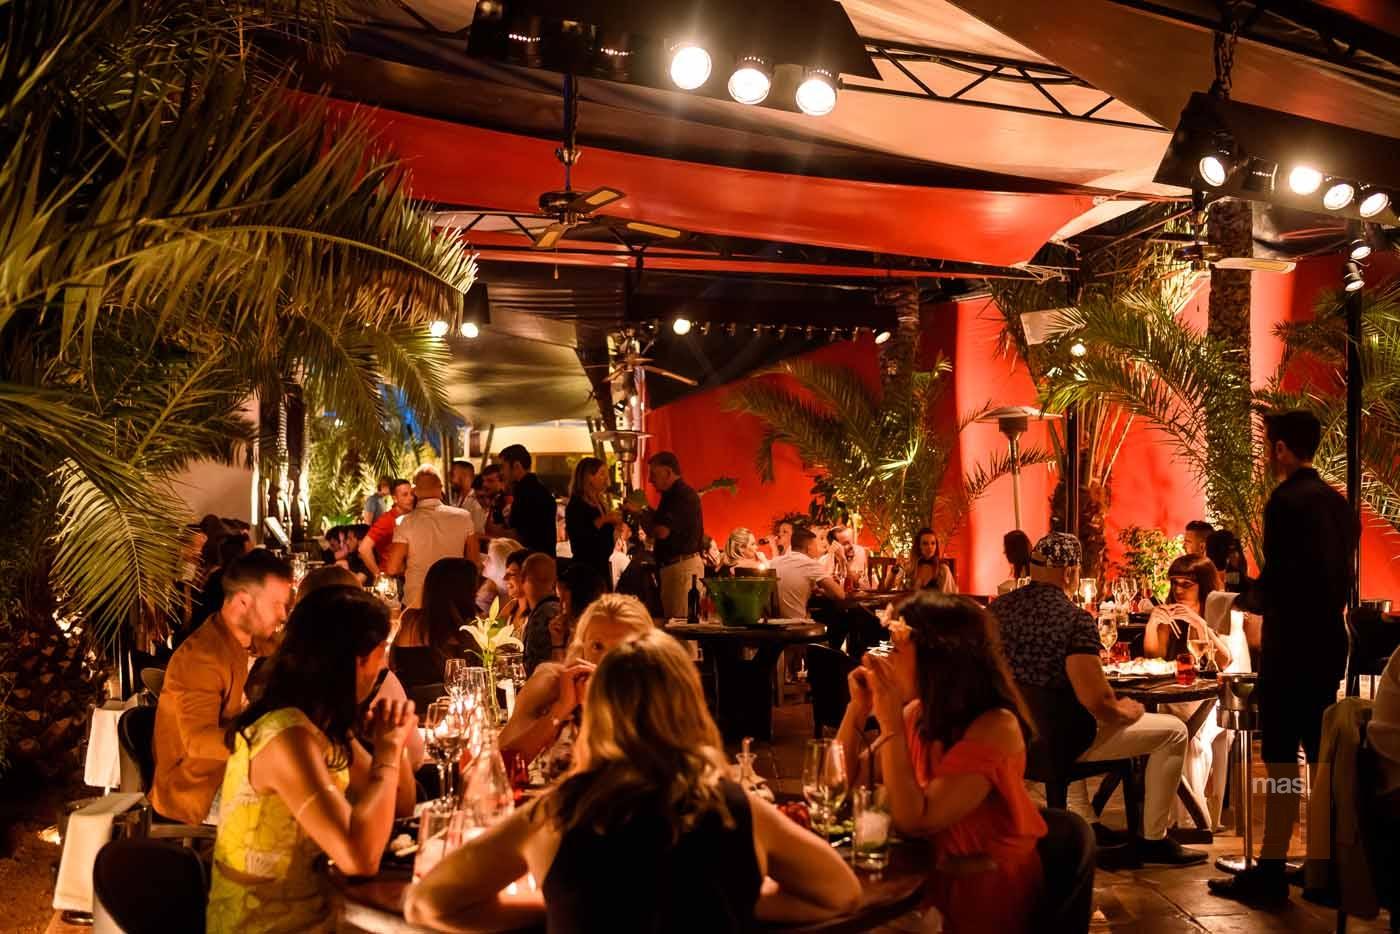 Restaurante Pachá. Fusión de culturas al plato